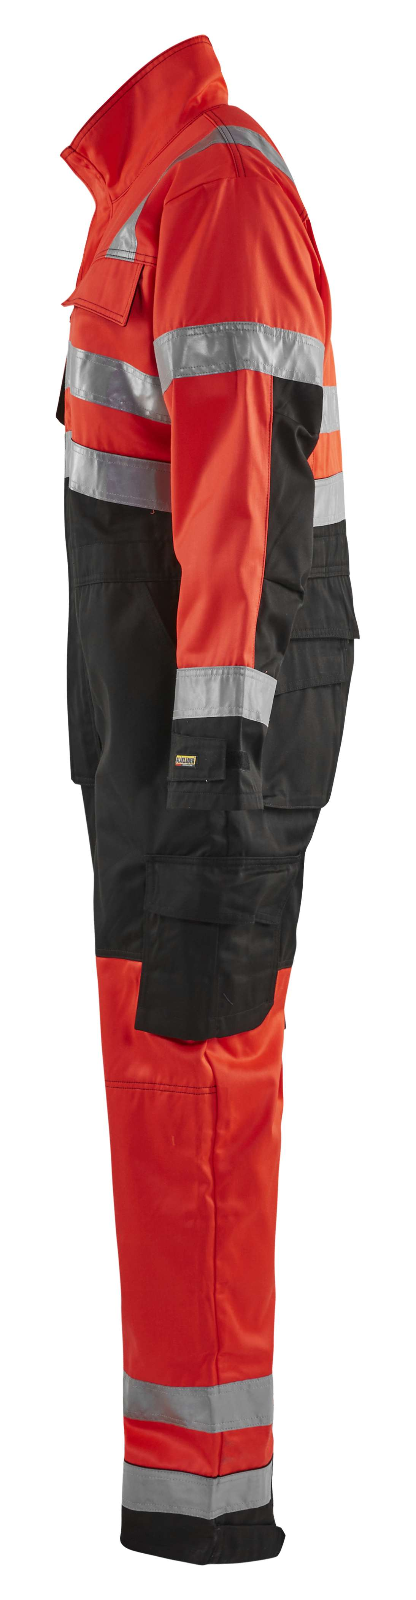 Blaklader Overalls 63731804 High Vis fluo rood-zwart(5599)